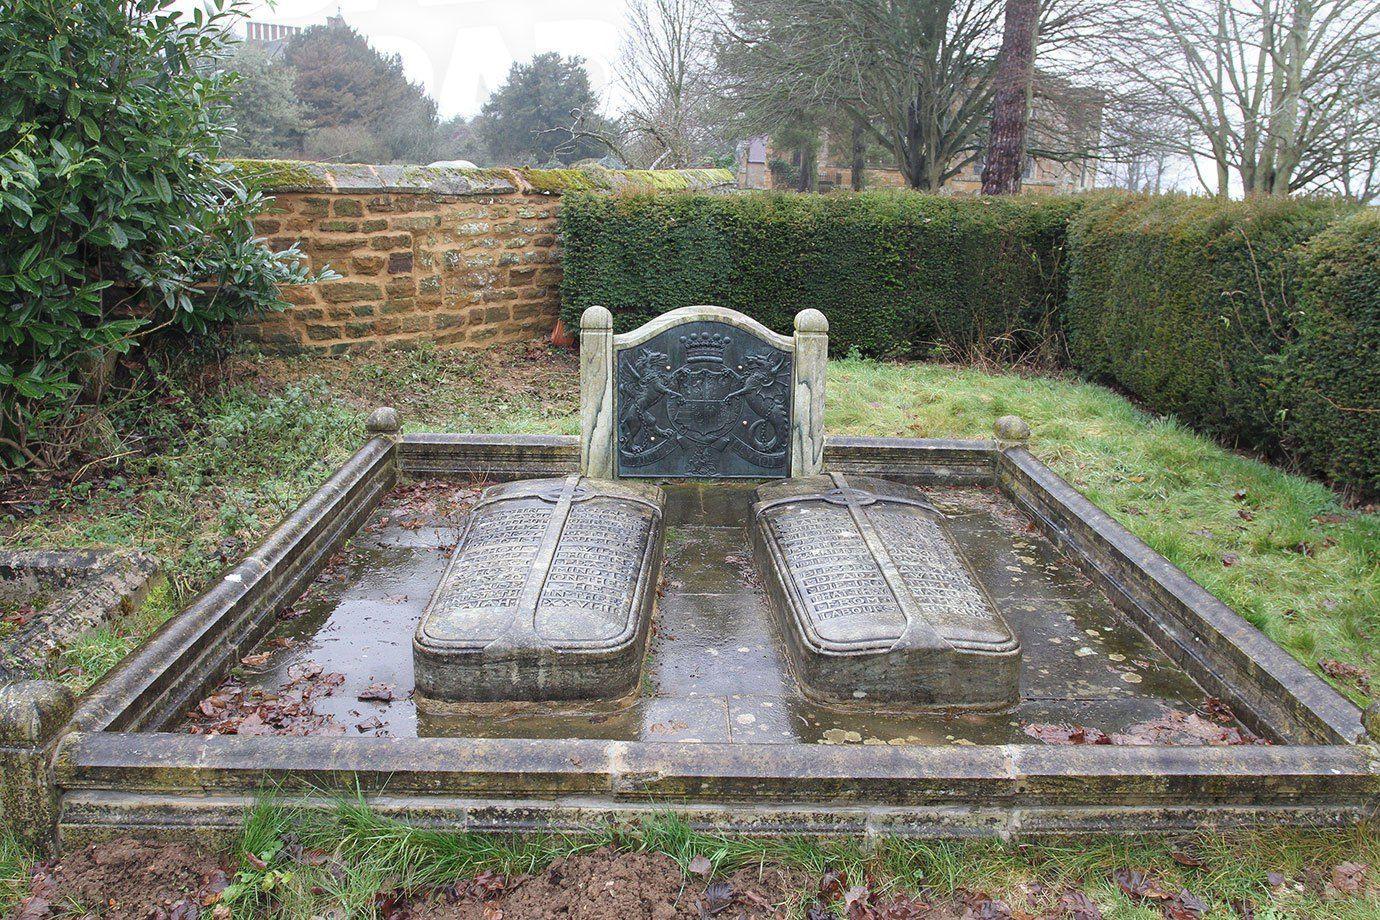 Princess Diana Burial Site The Image